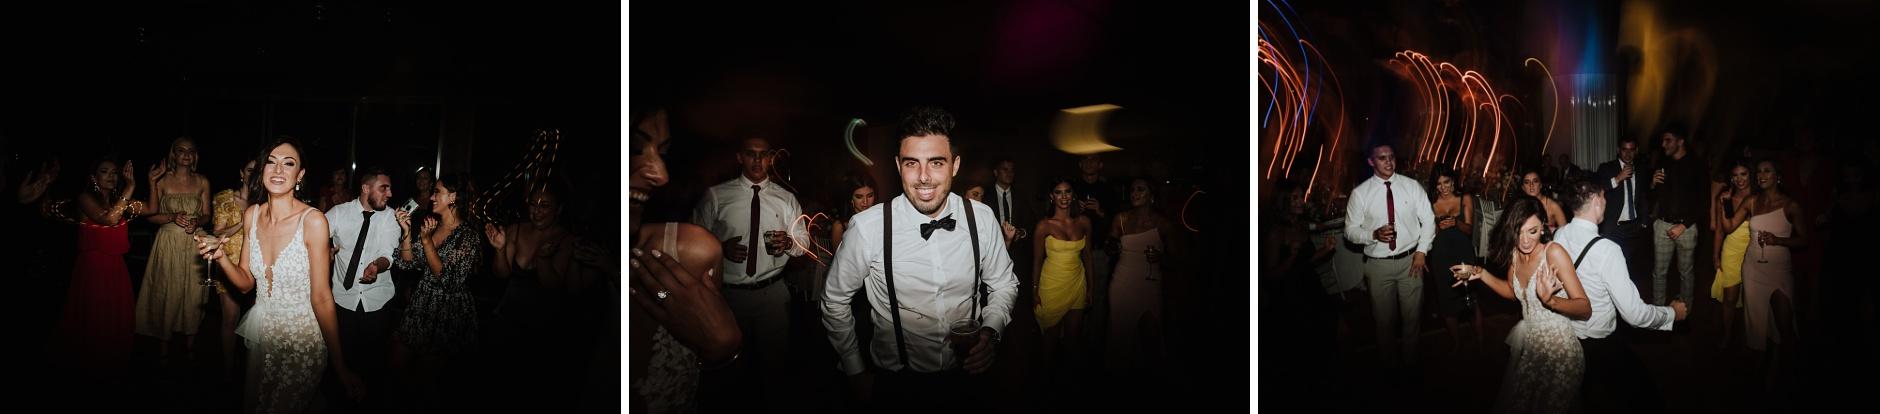 Sydney-Wedding-Photographer_0180.jpg